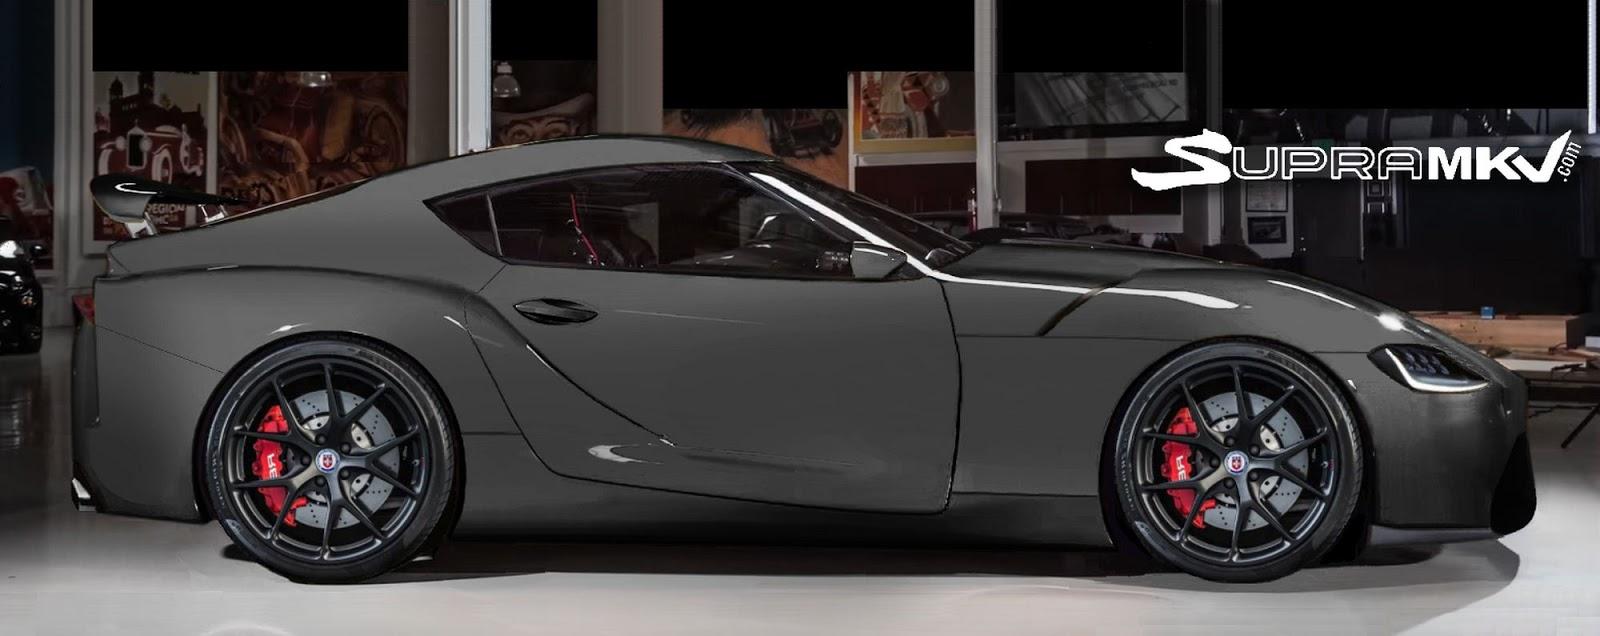 Toyota-Supra-Rendering-4